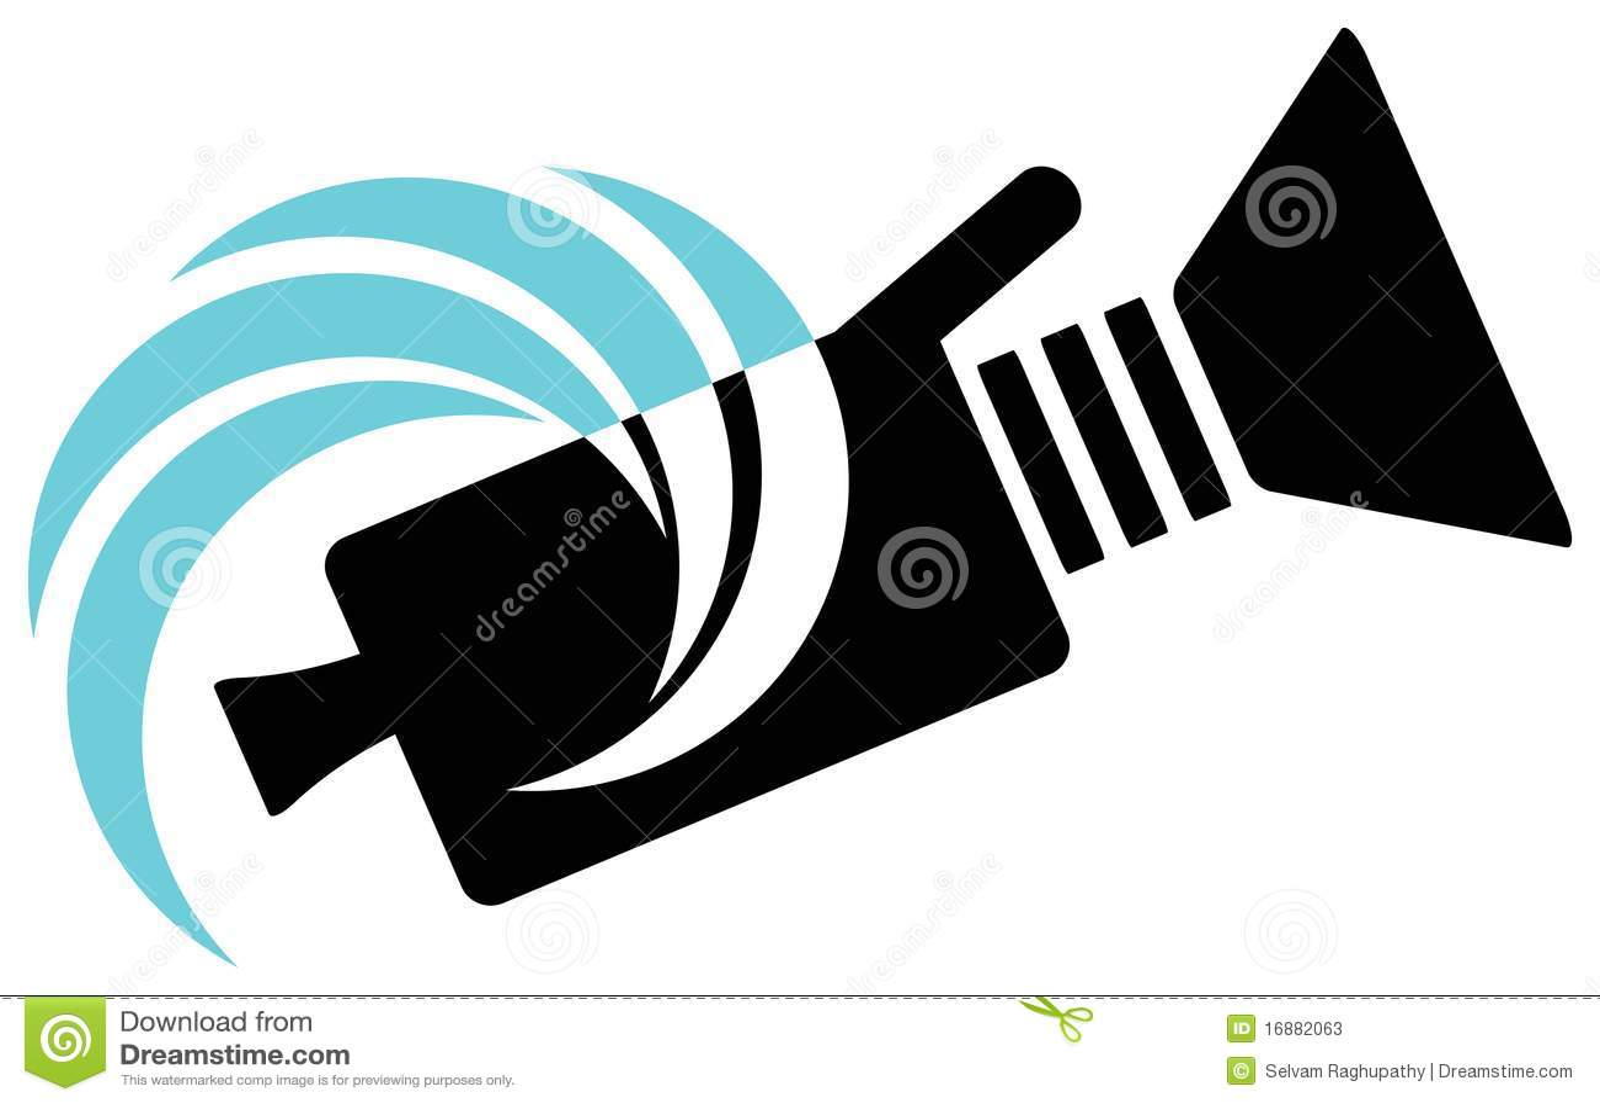 Camera Logo Stock Photos - Image: 16882063  Camera Logo Sto...